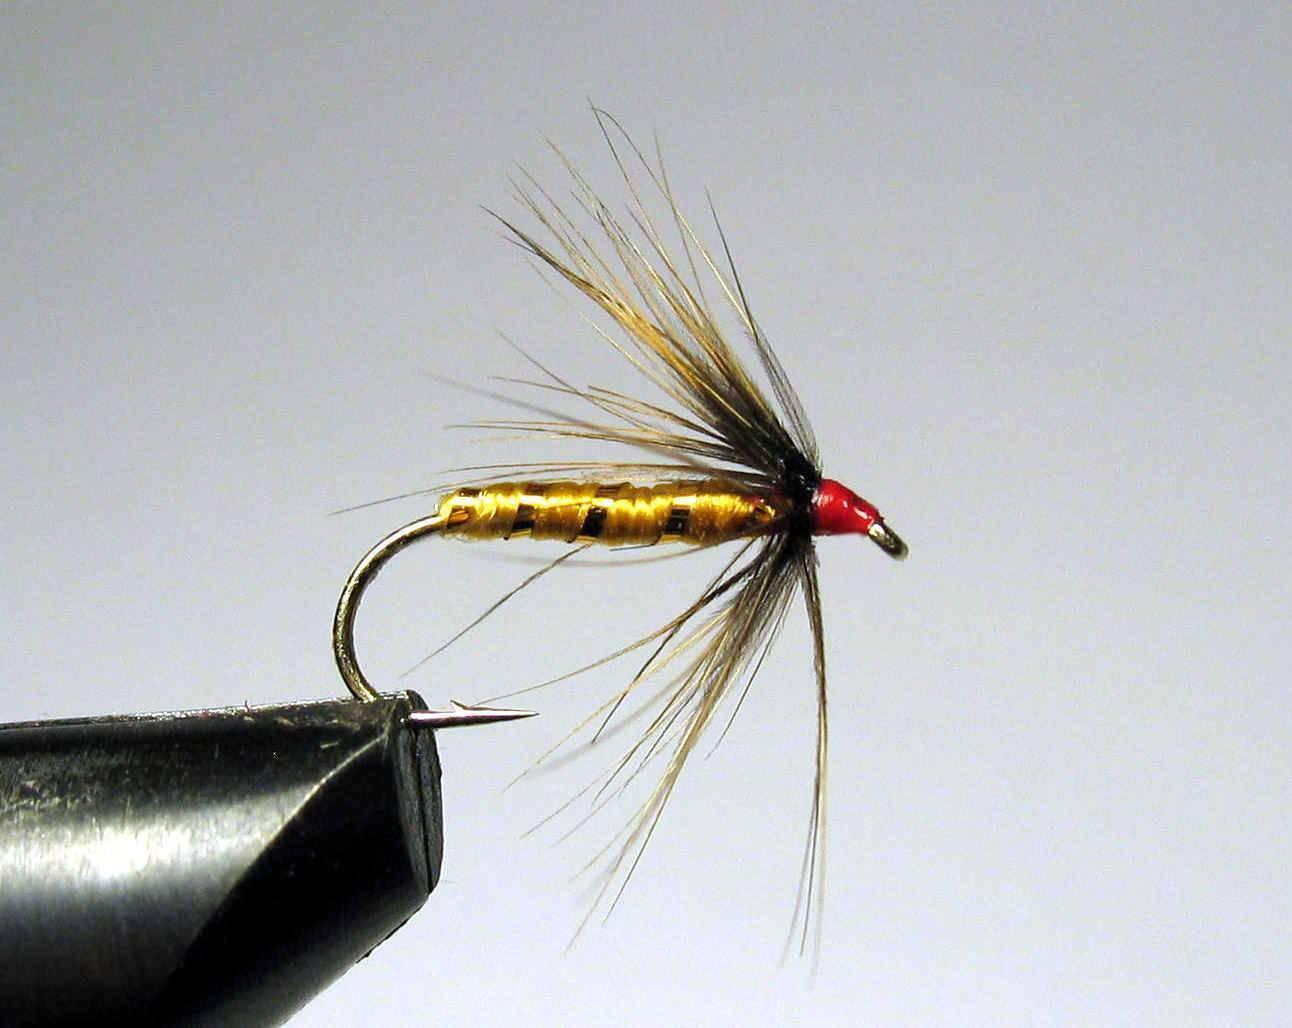 Мушки на хариуса: как ловить, виды, самые уловистые мушки, мушки своими руками и снасти для ловли на мушки